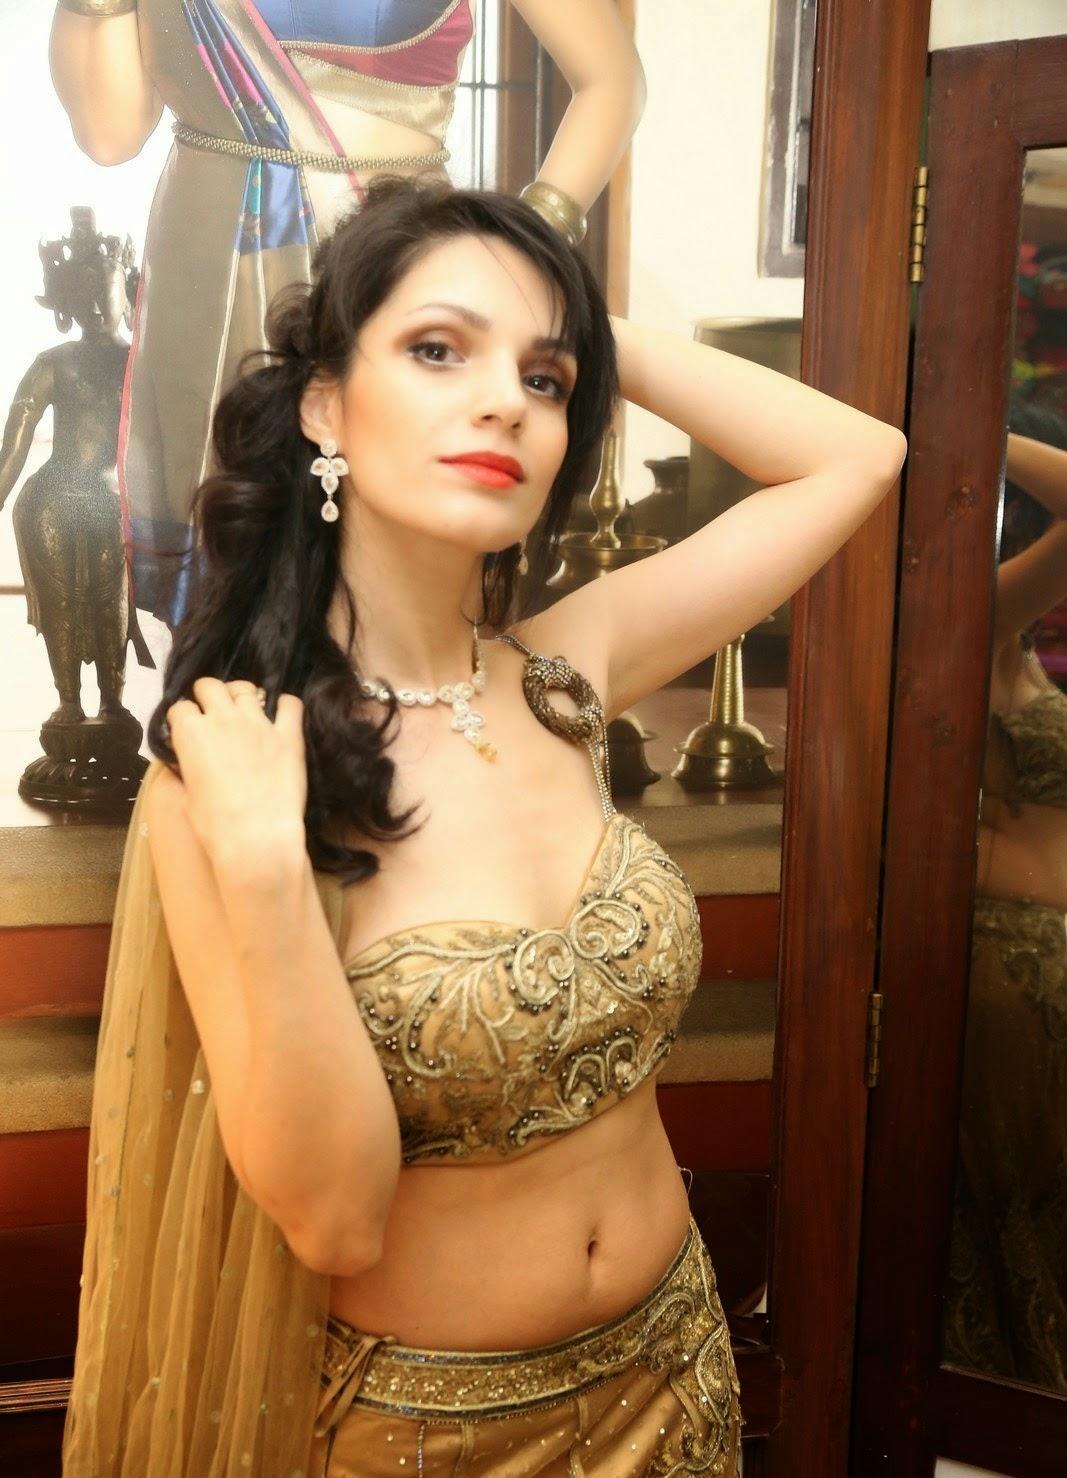 Paparazzi Cleavage Clara Bindi  nudes (45 pictures), 2019, lingerie